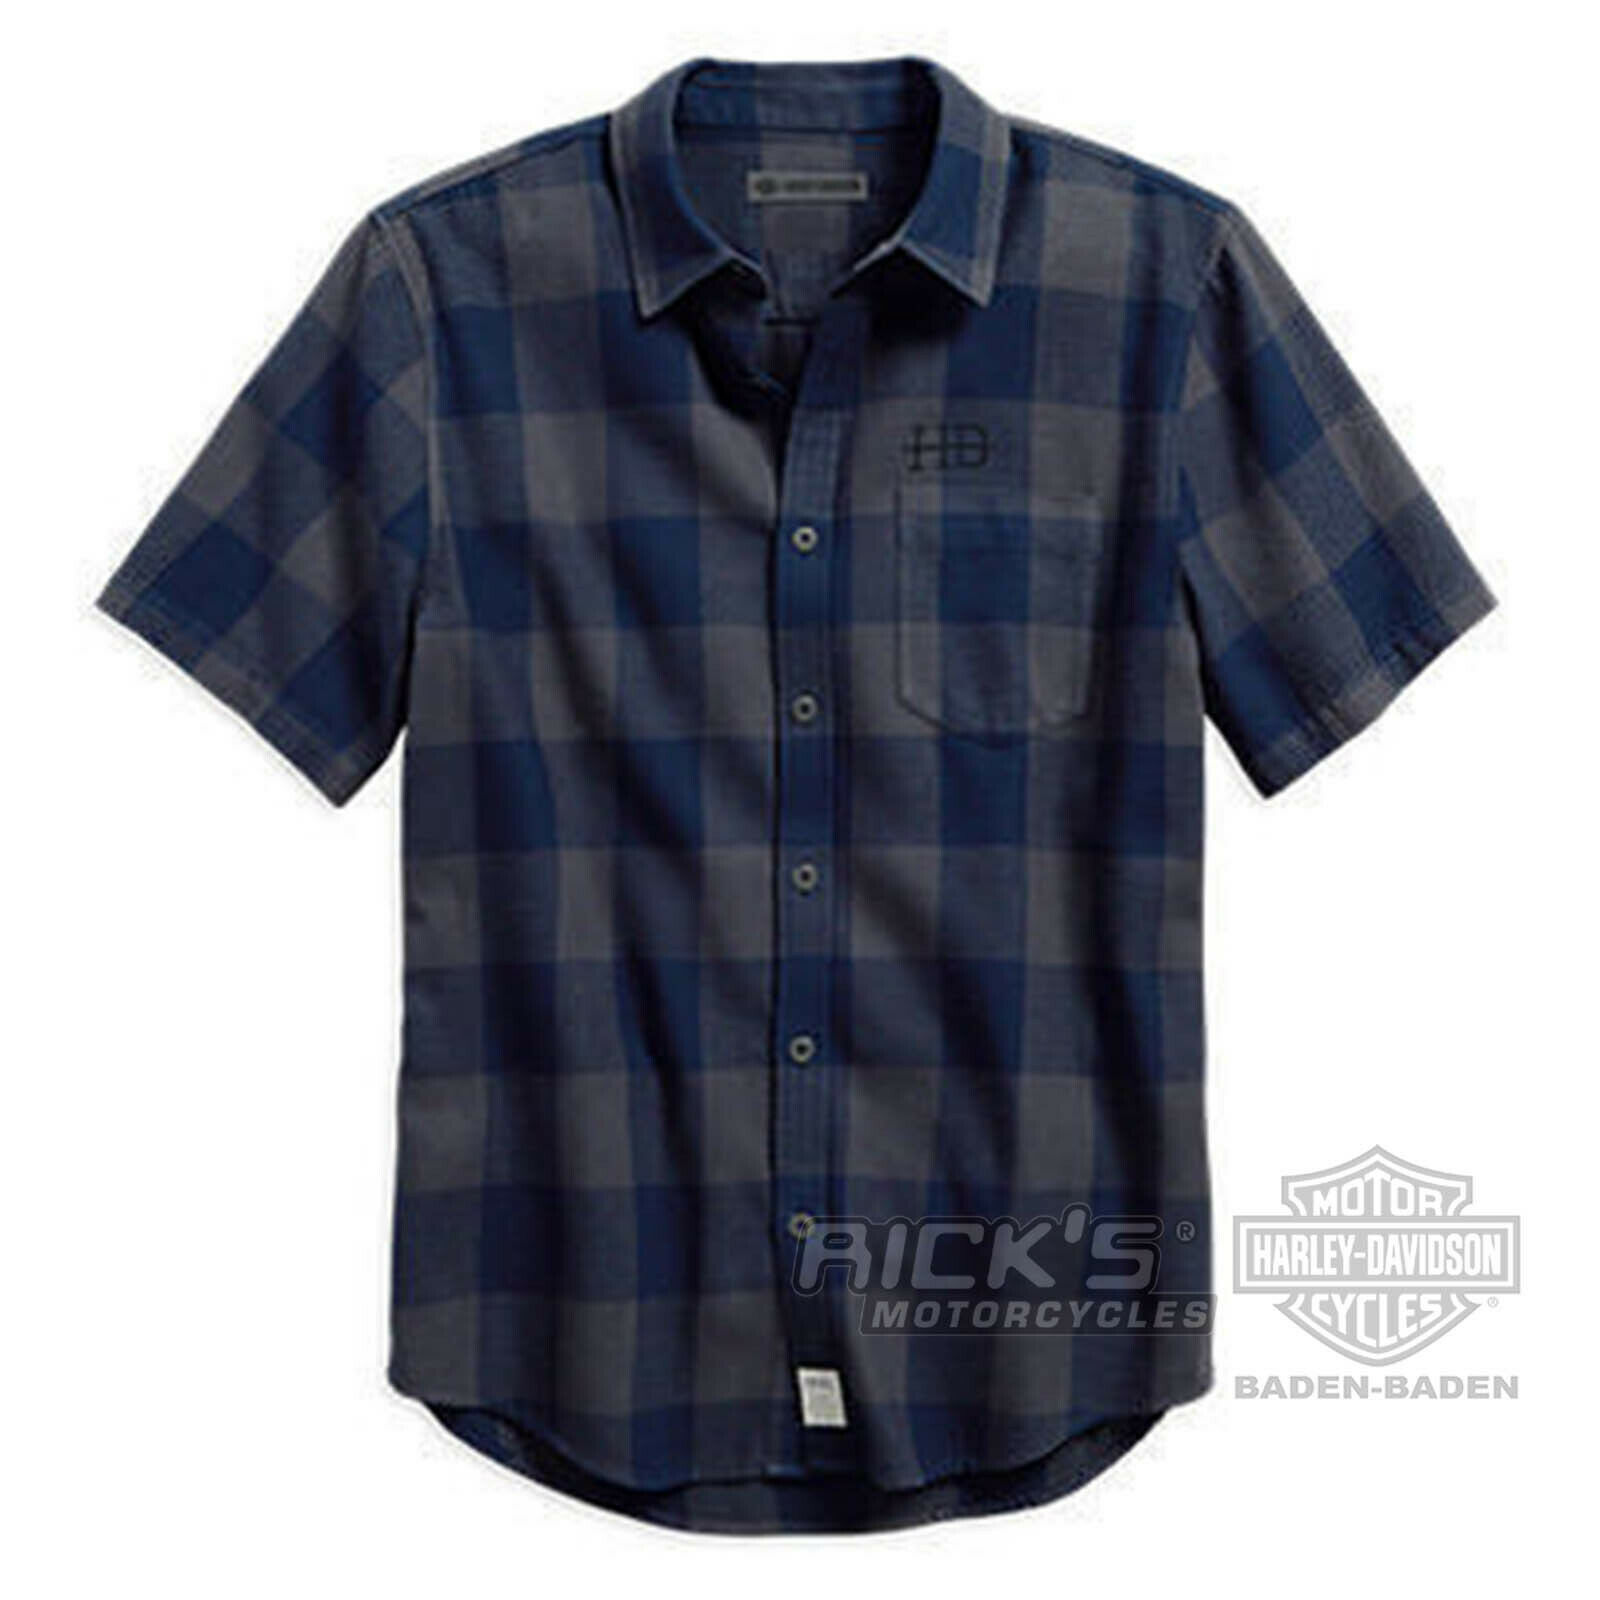 Orig. Harley-Davidson Men's Leisure Shirt 96163-18VM